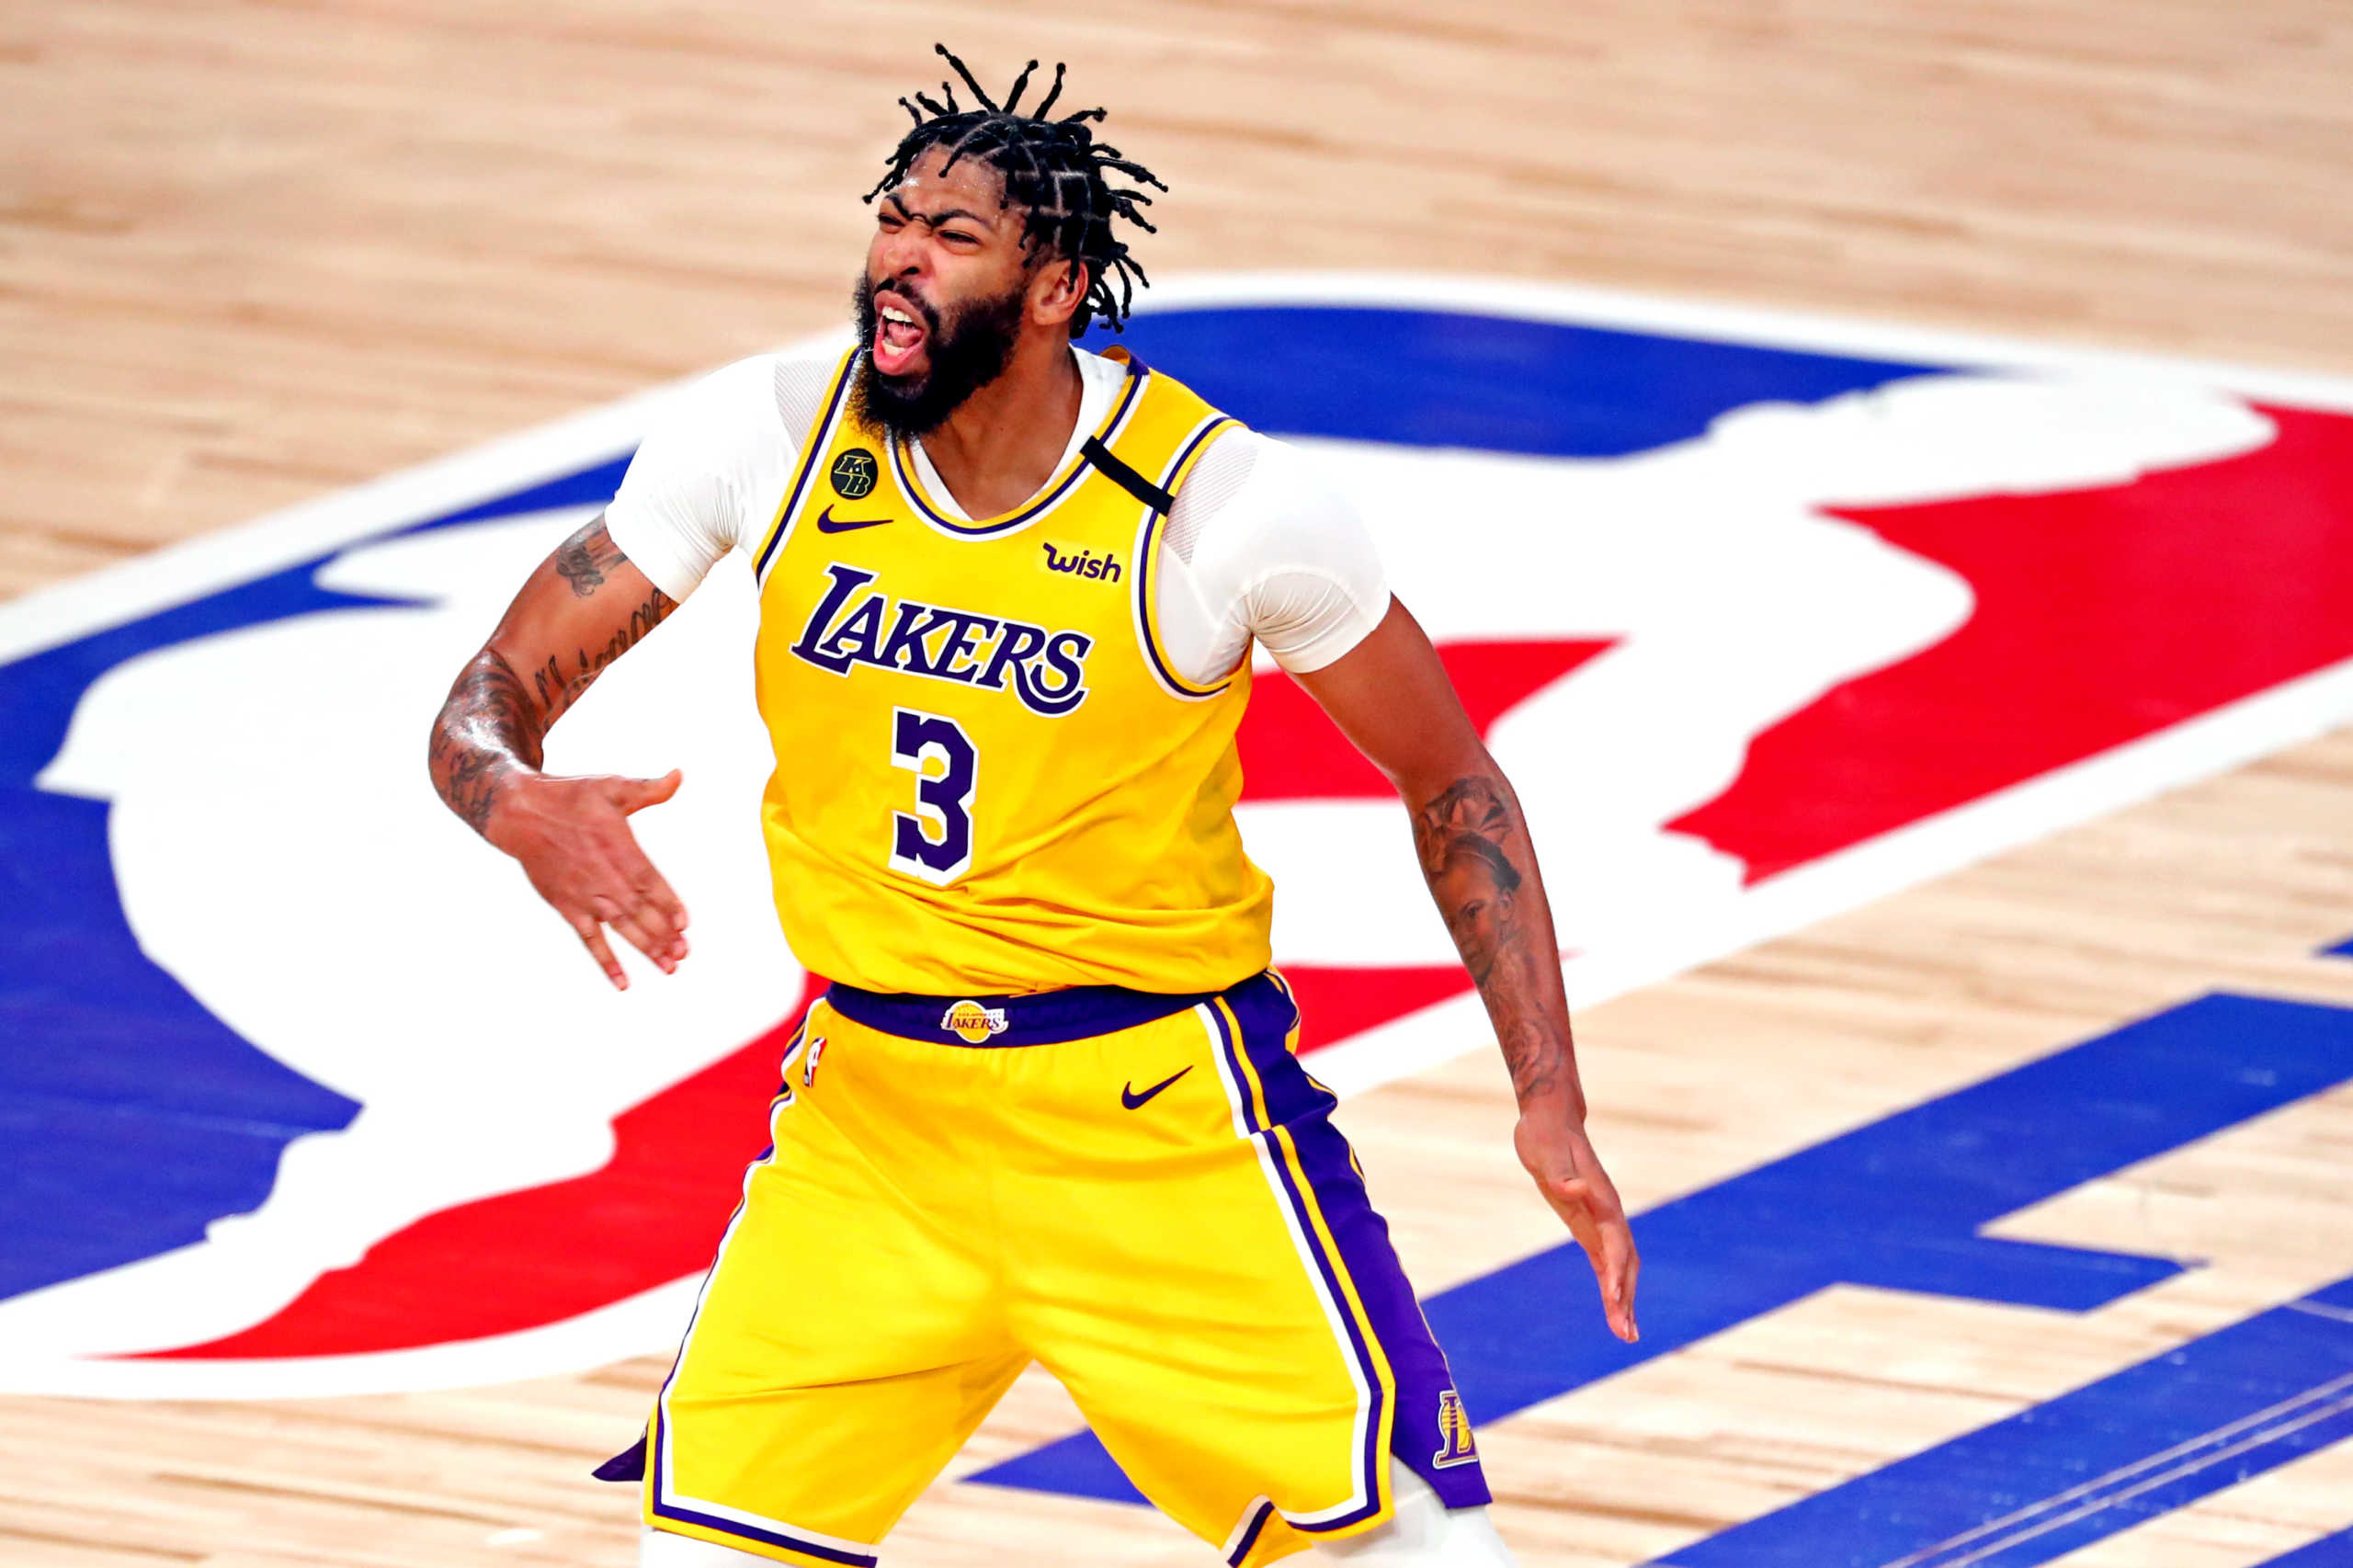 NBA – Λέικερς: Πάνω από ένα μήνα εκτός ο Άντονι Ντέιβις